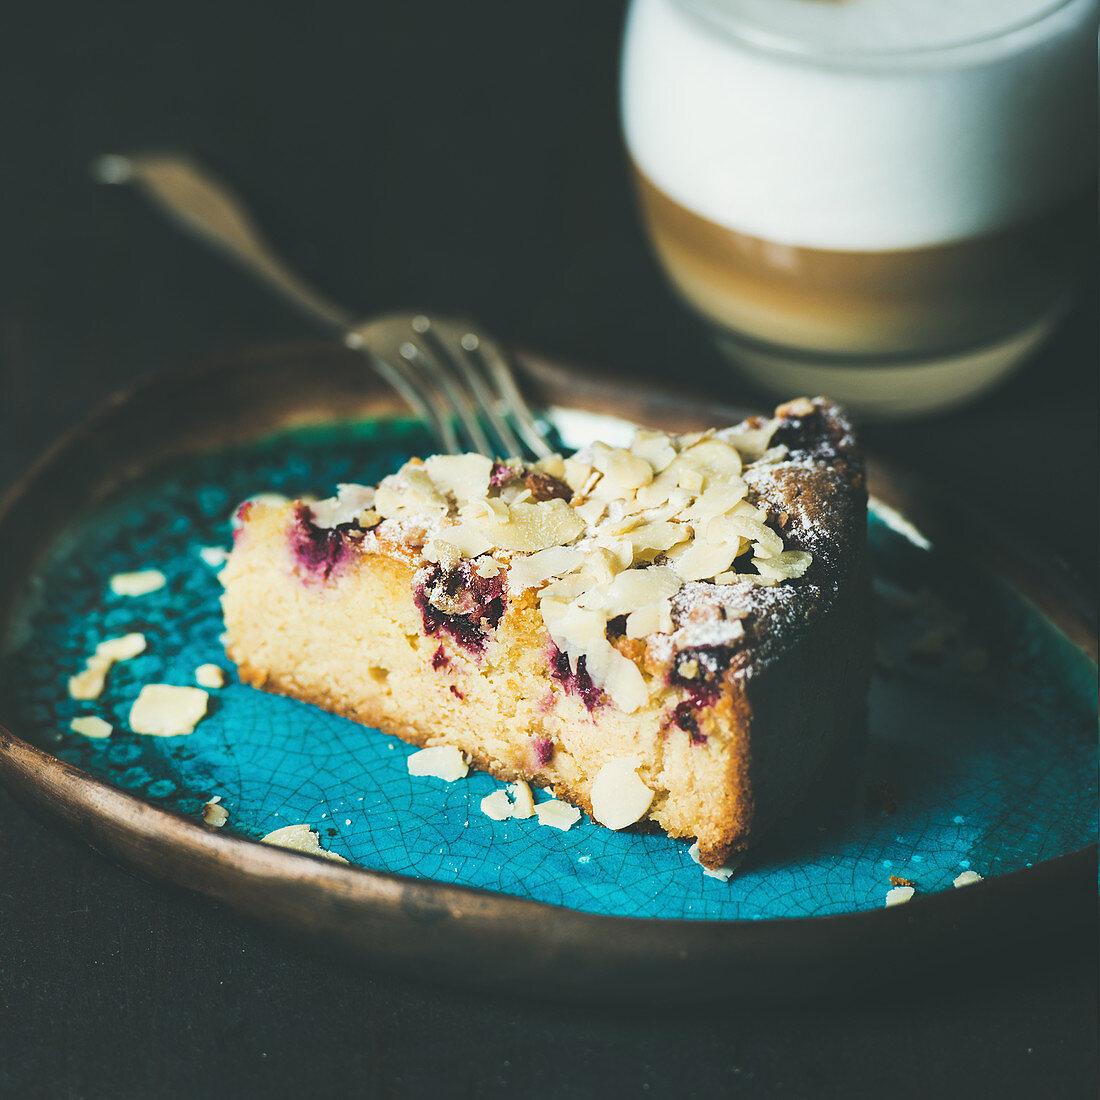 Dessert and coffee. Piece of lemon, ricotta, almond and raspberry gluten-free cake